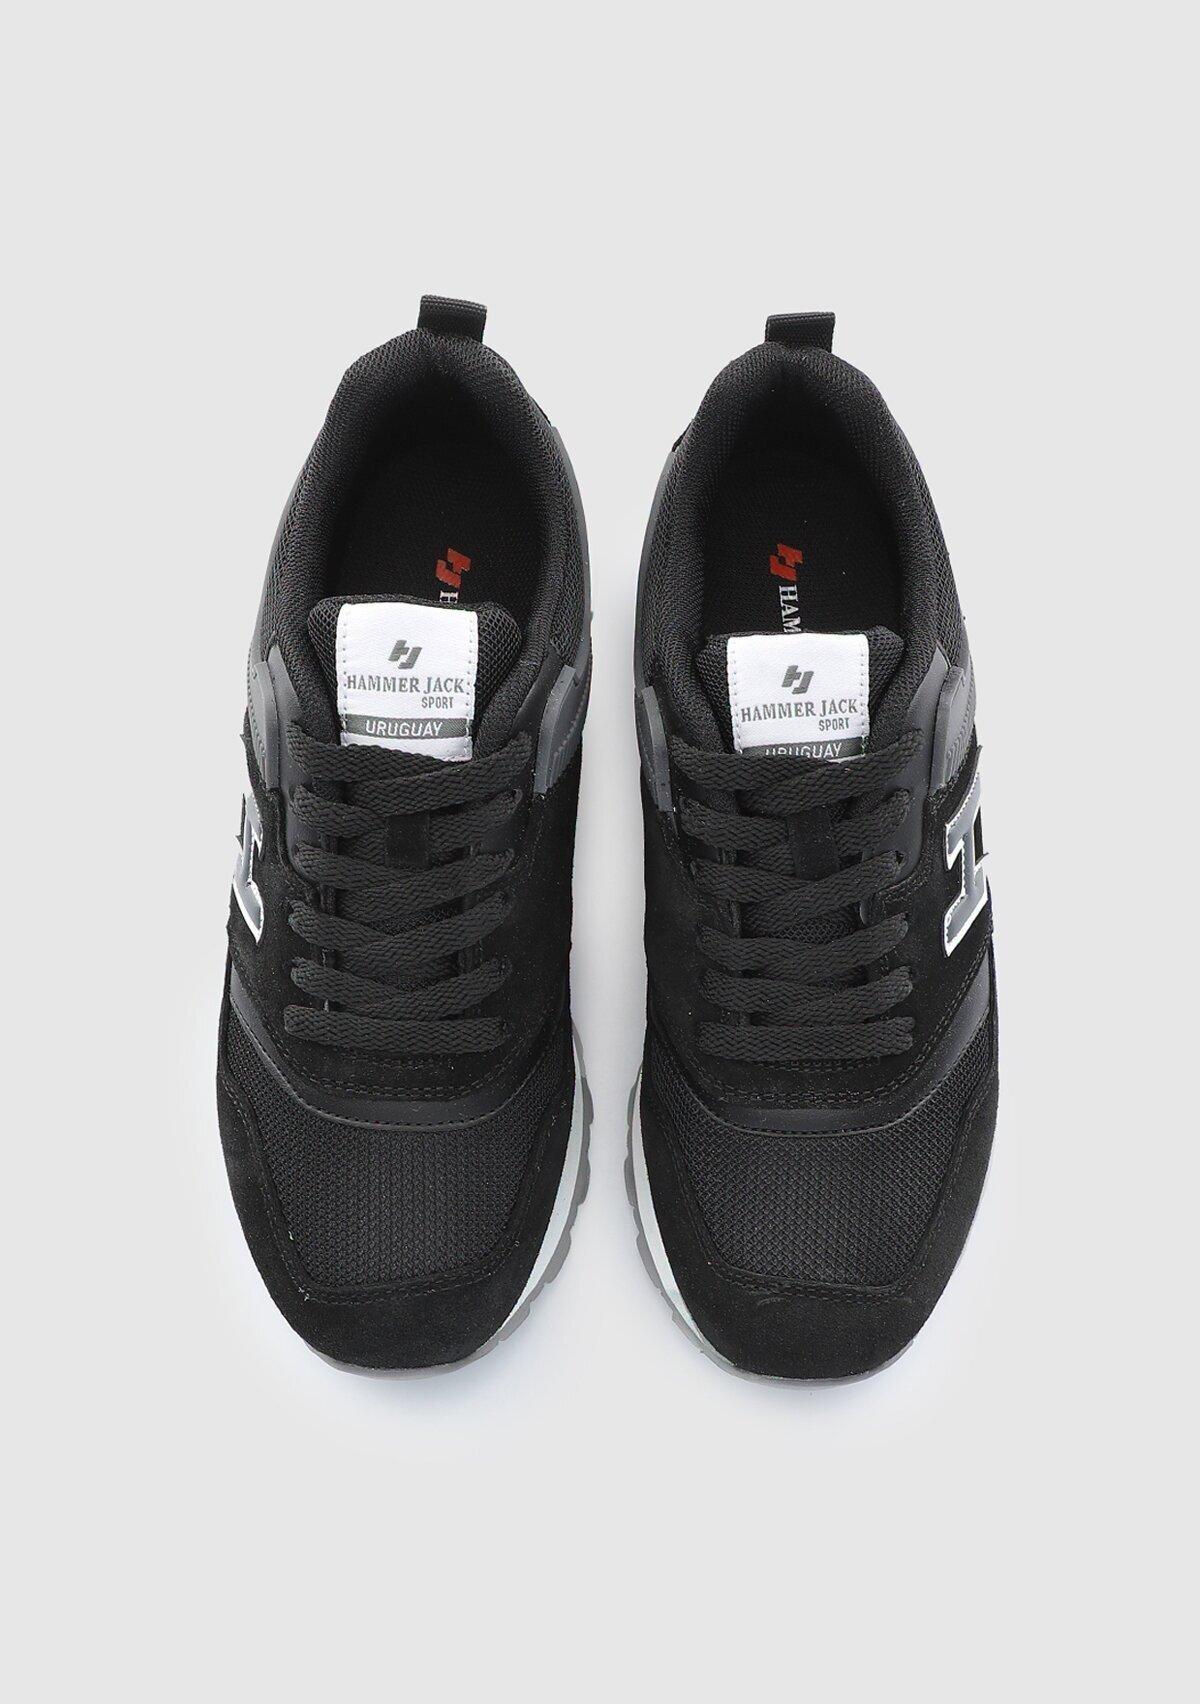 resm Siyah-Koyu Gri Kadın Sneaker